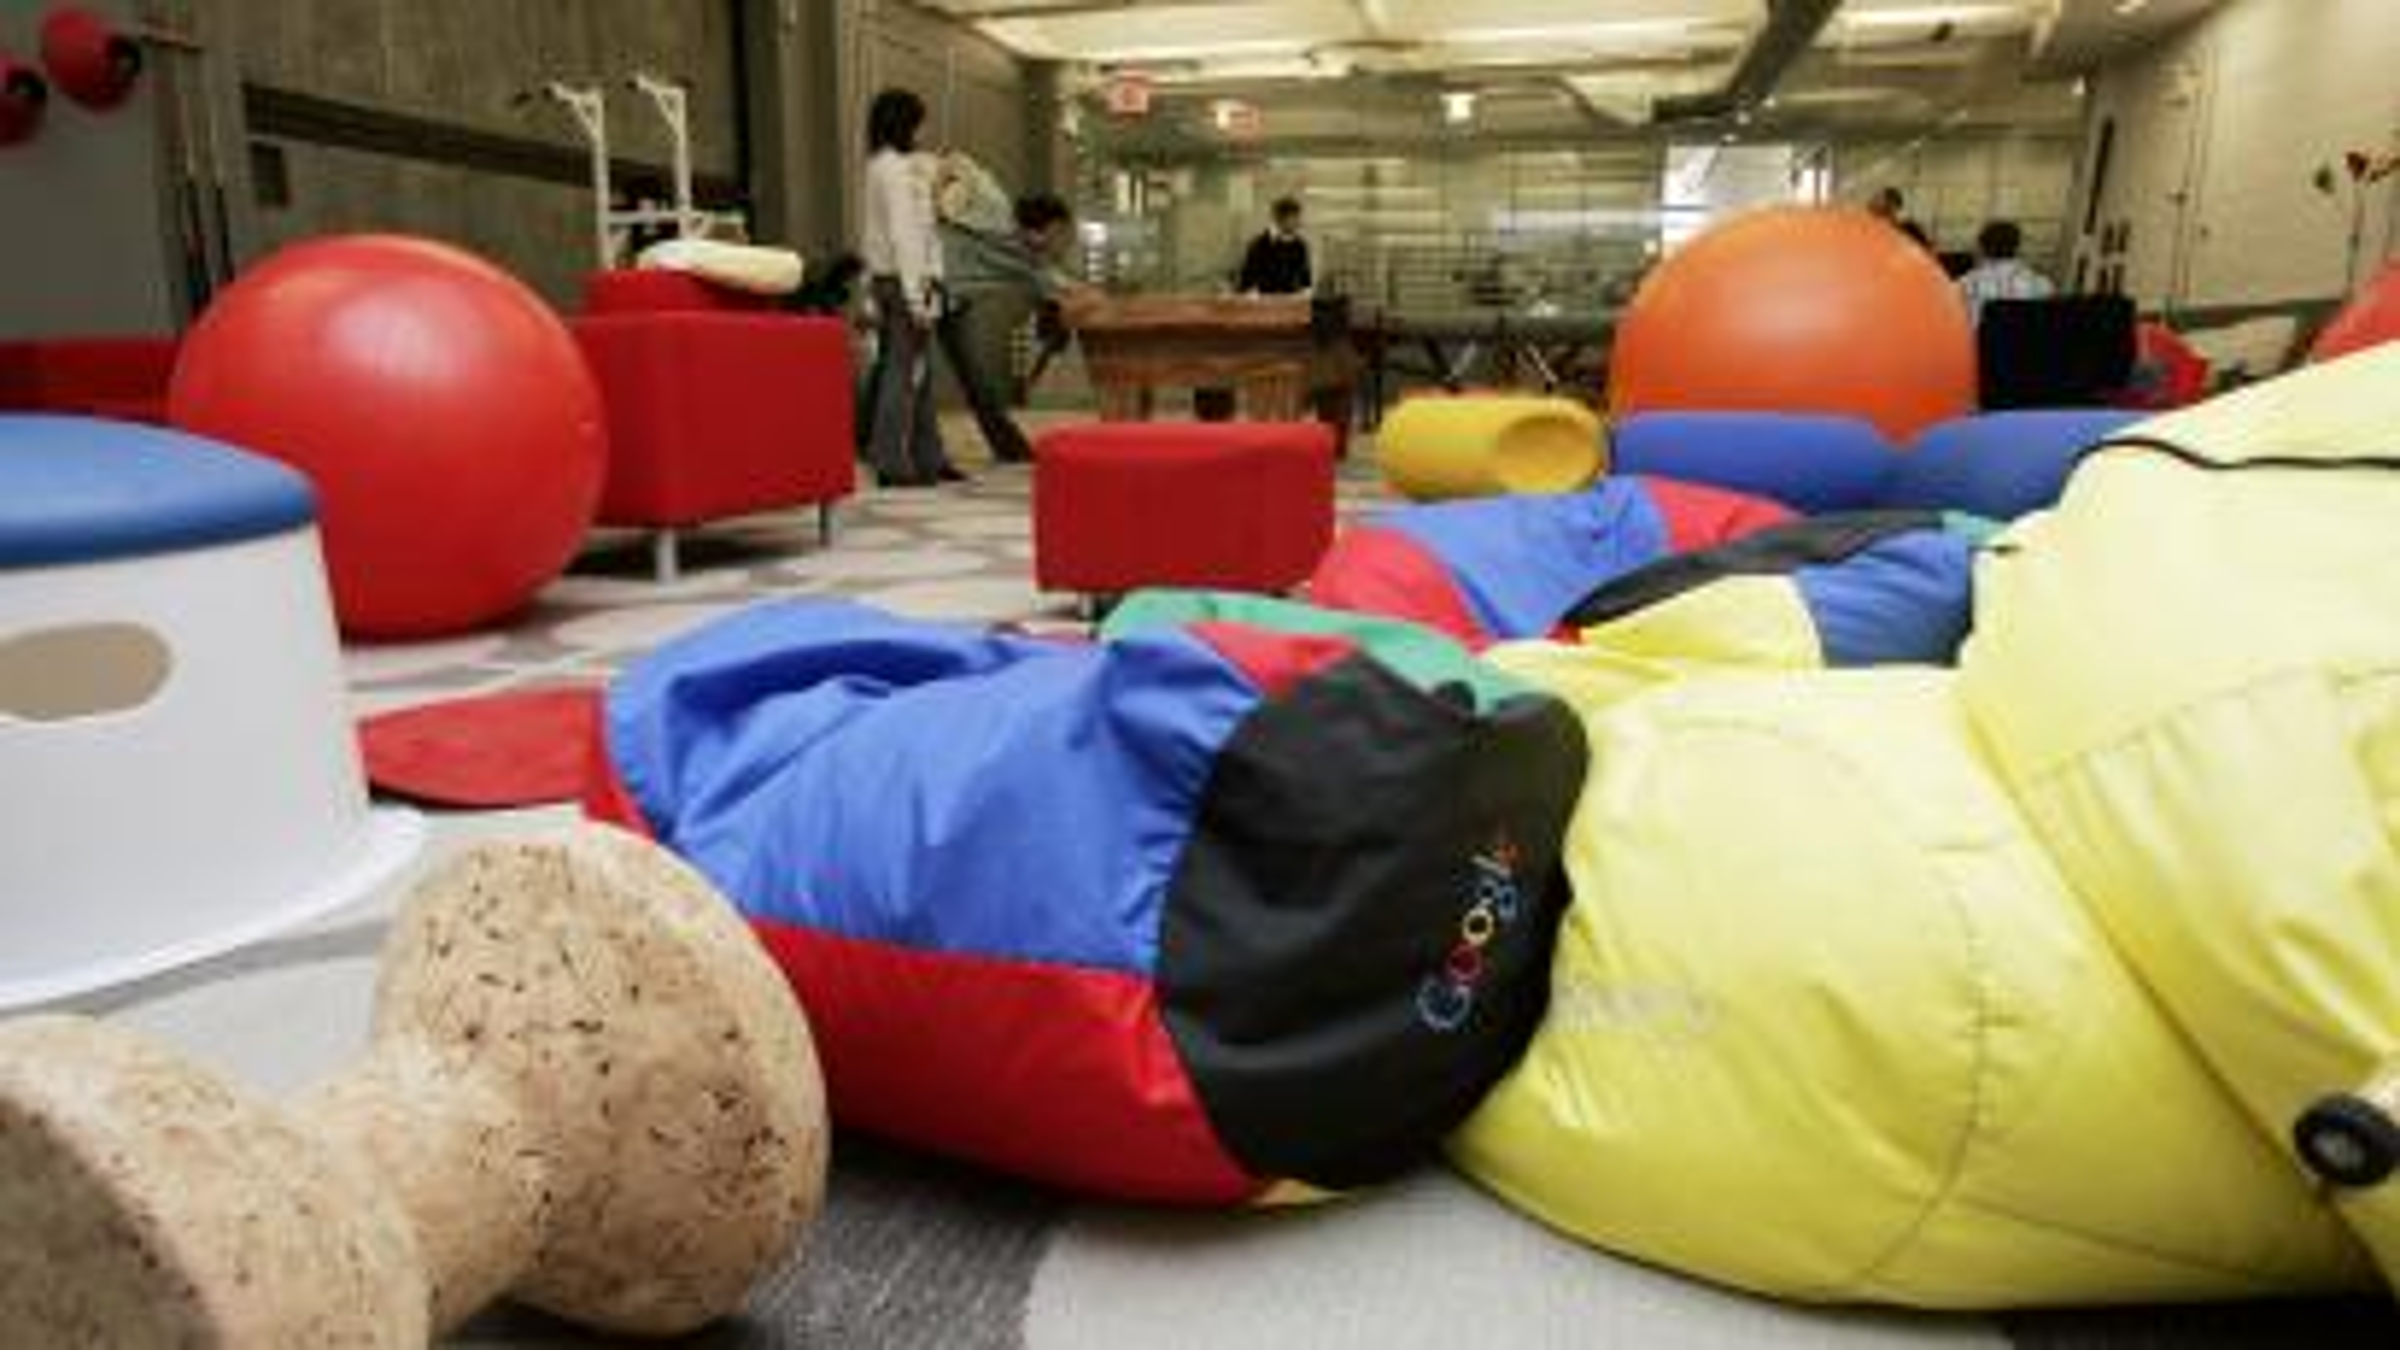 Google's game room